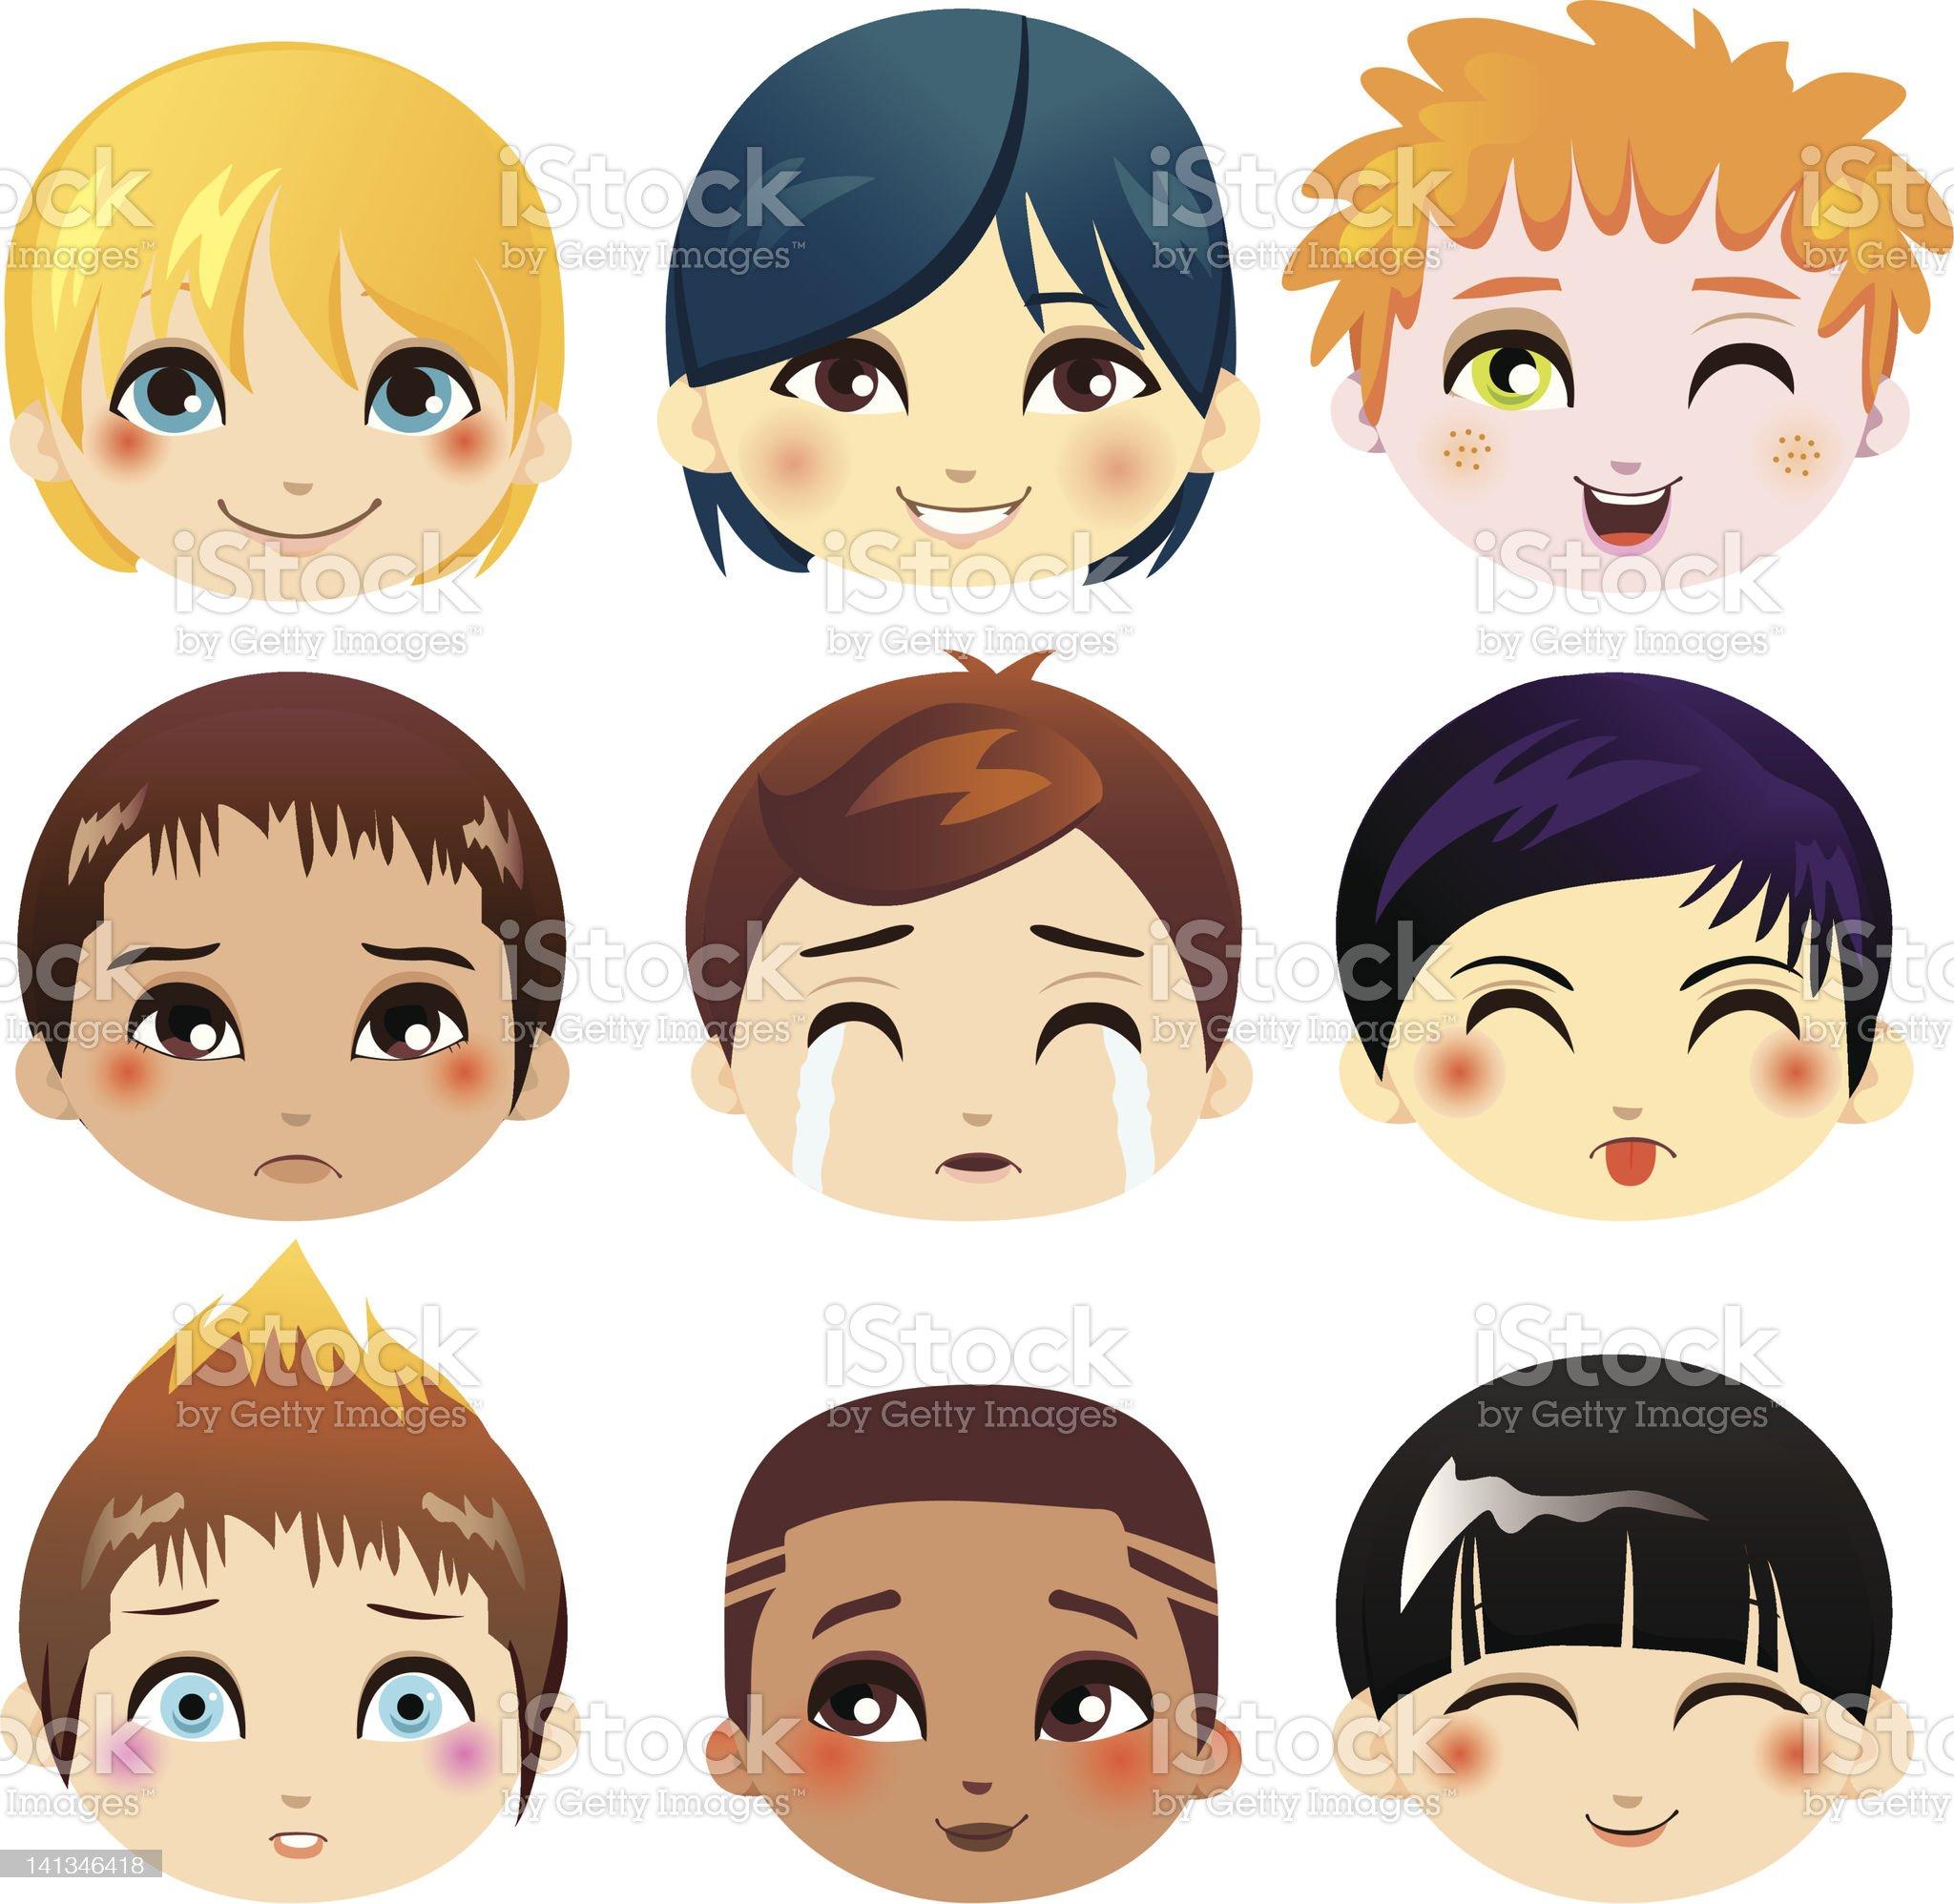 Facial Expression Collection royalty-free stock vector art